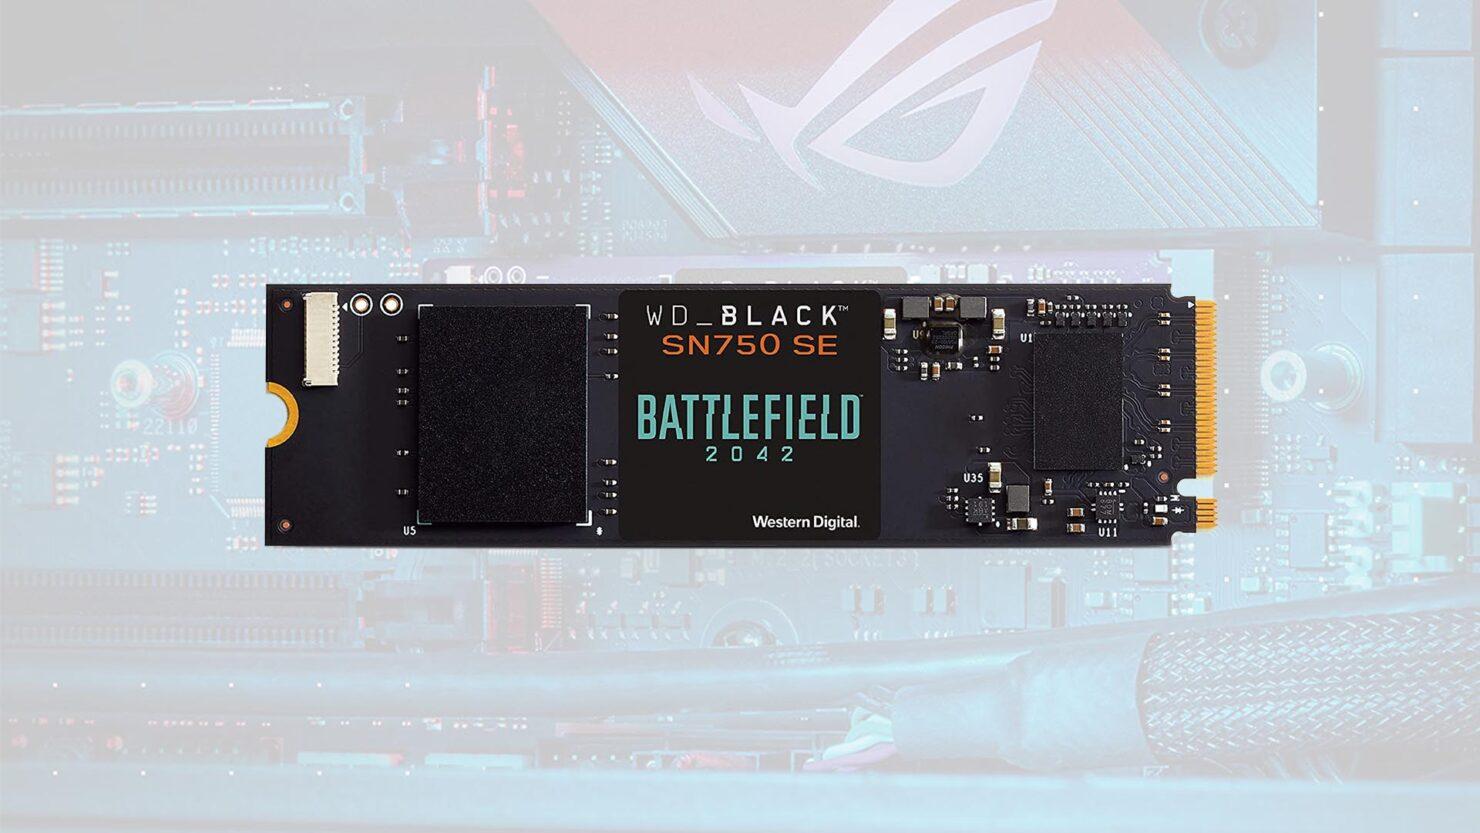 WD_BLACK SN 750 SE NVMe SSD Bundle Now Gives You a Battlefield 2042 Game Code